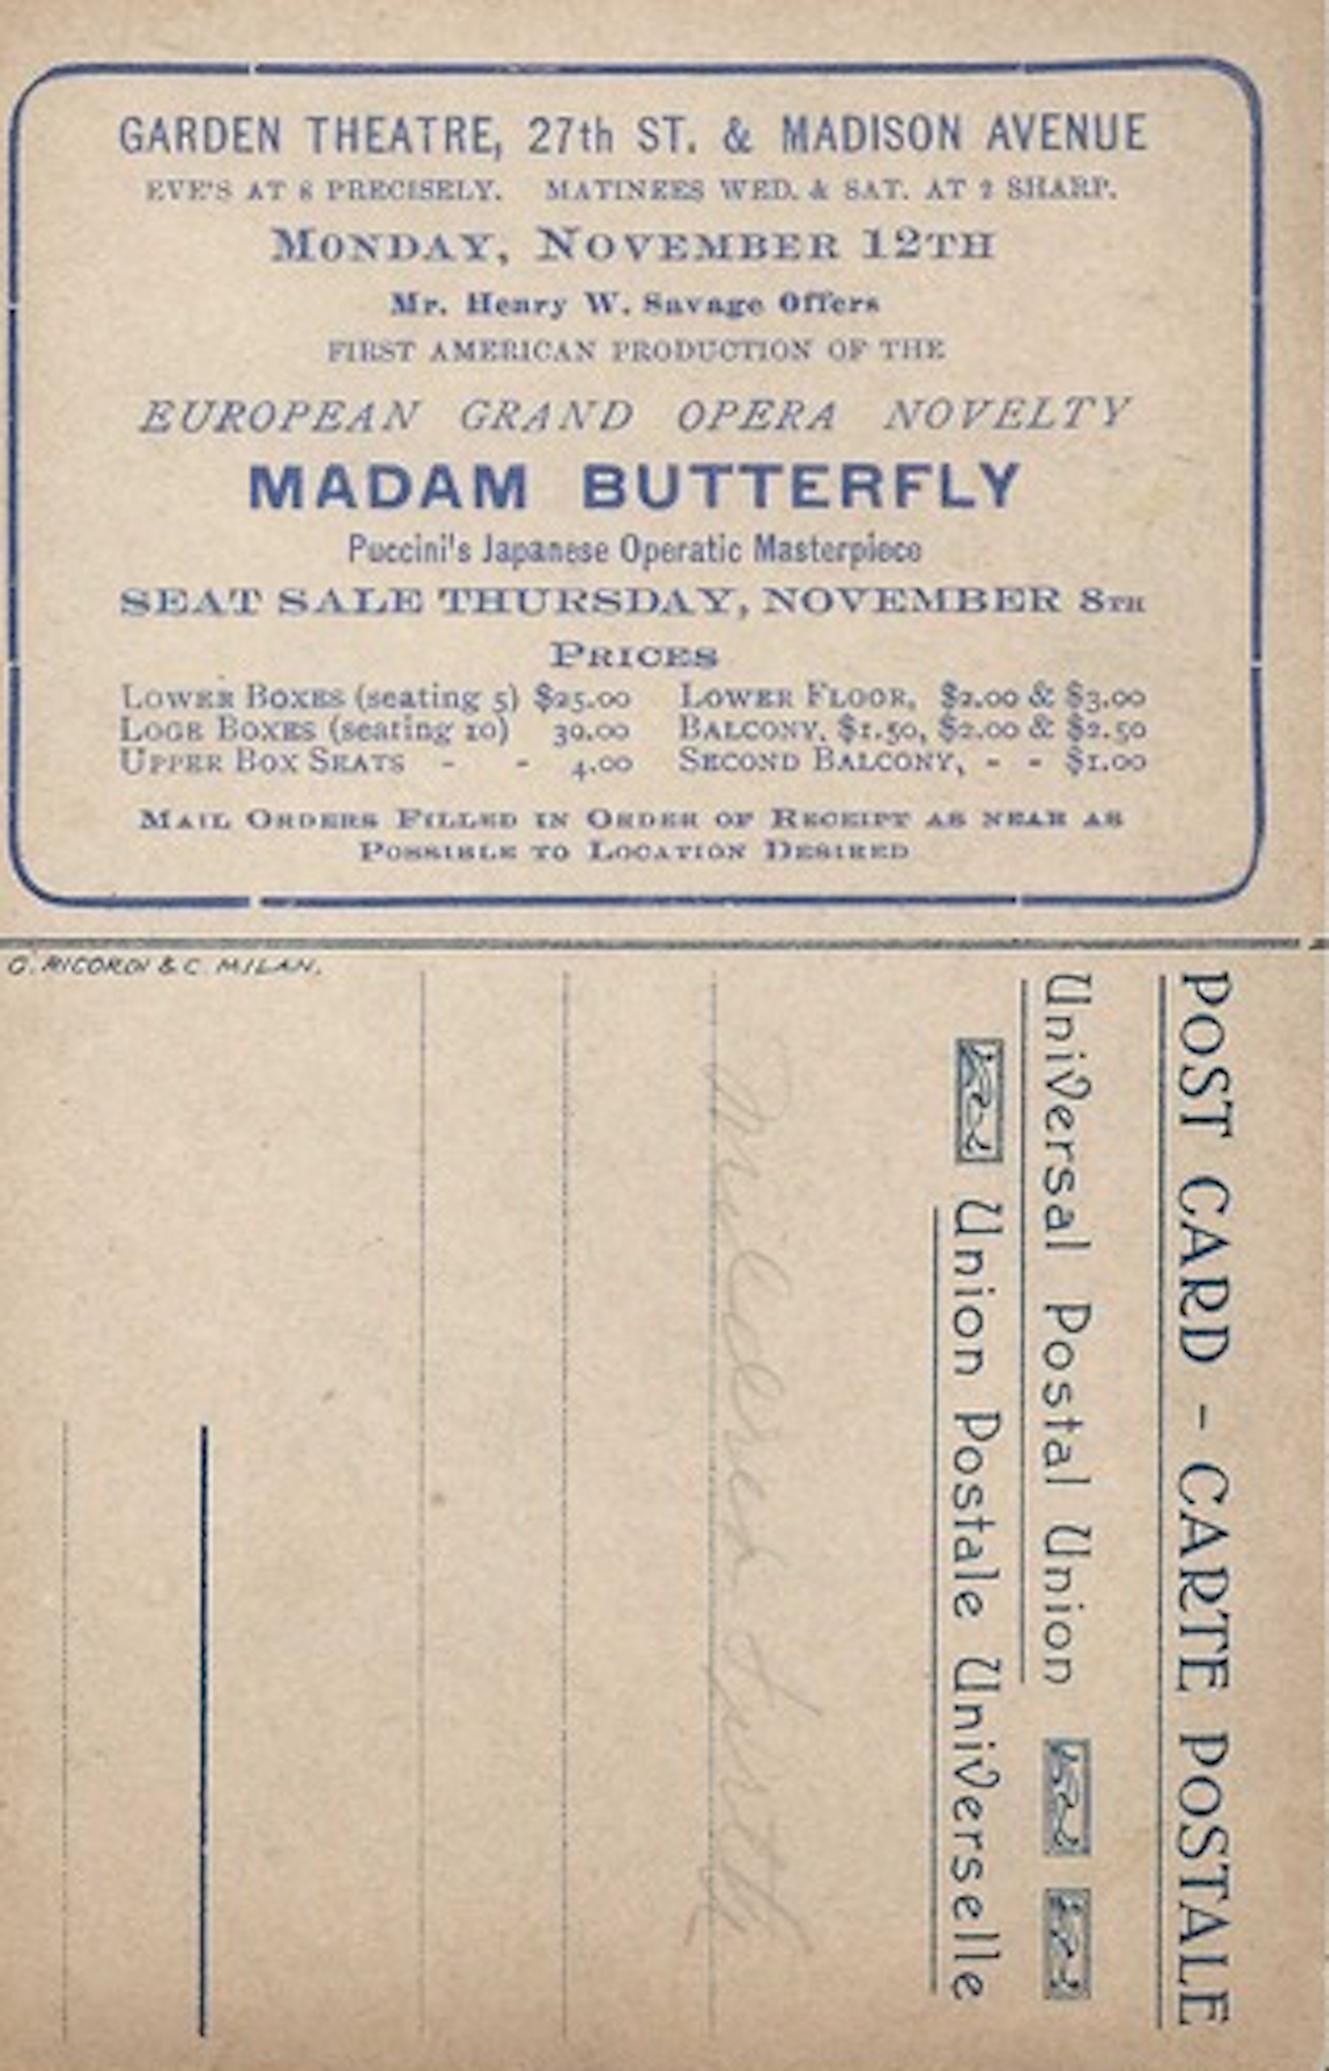 Фото: postcardhistory.net